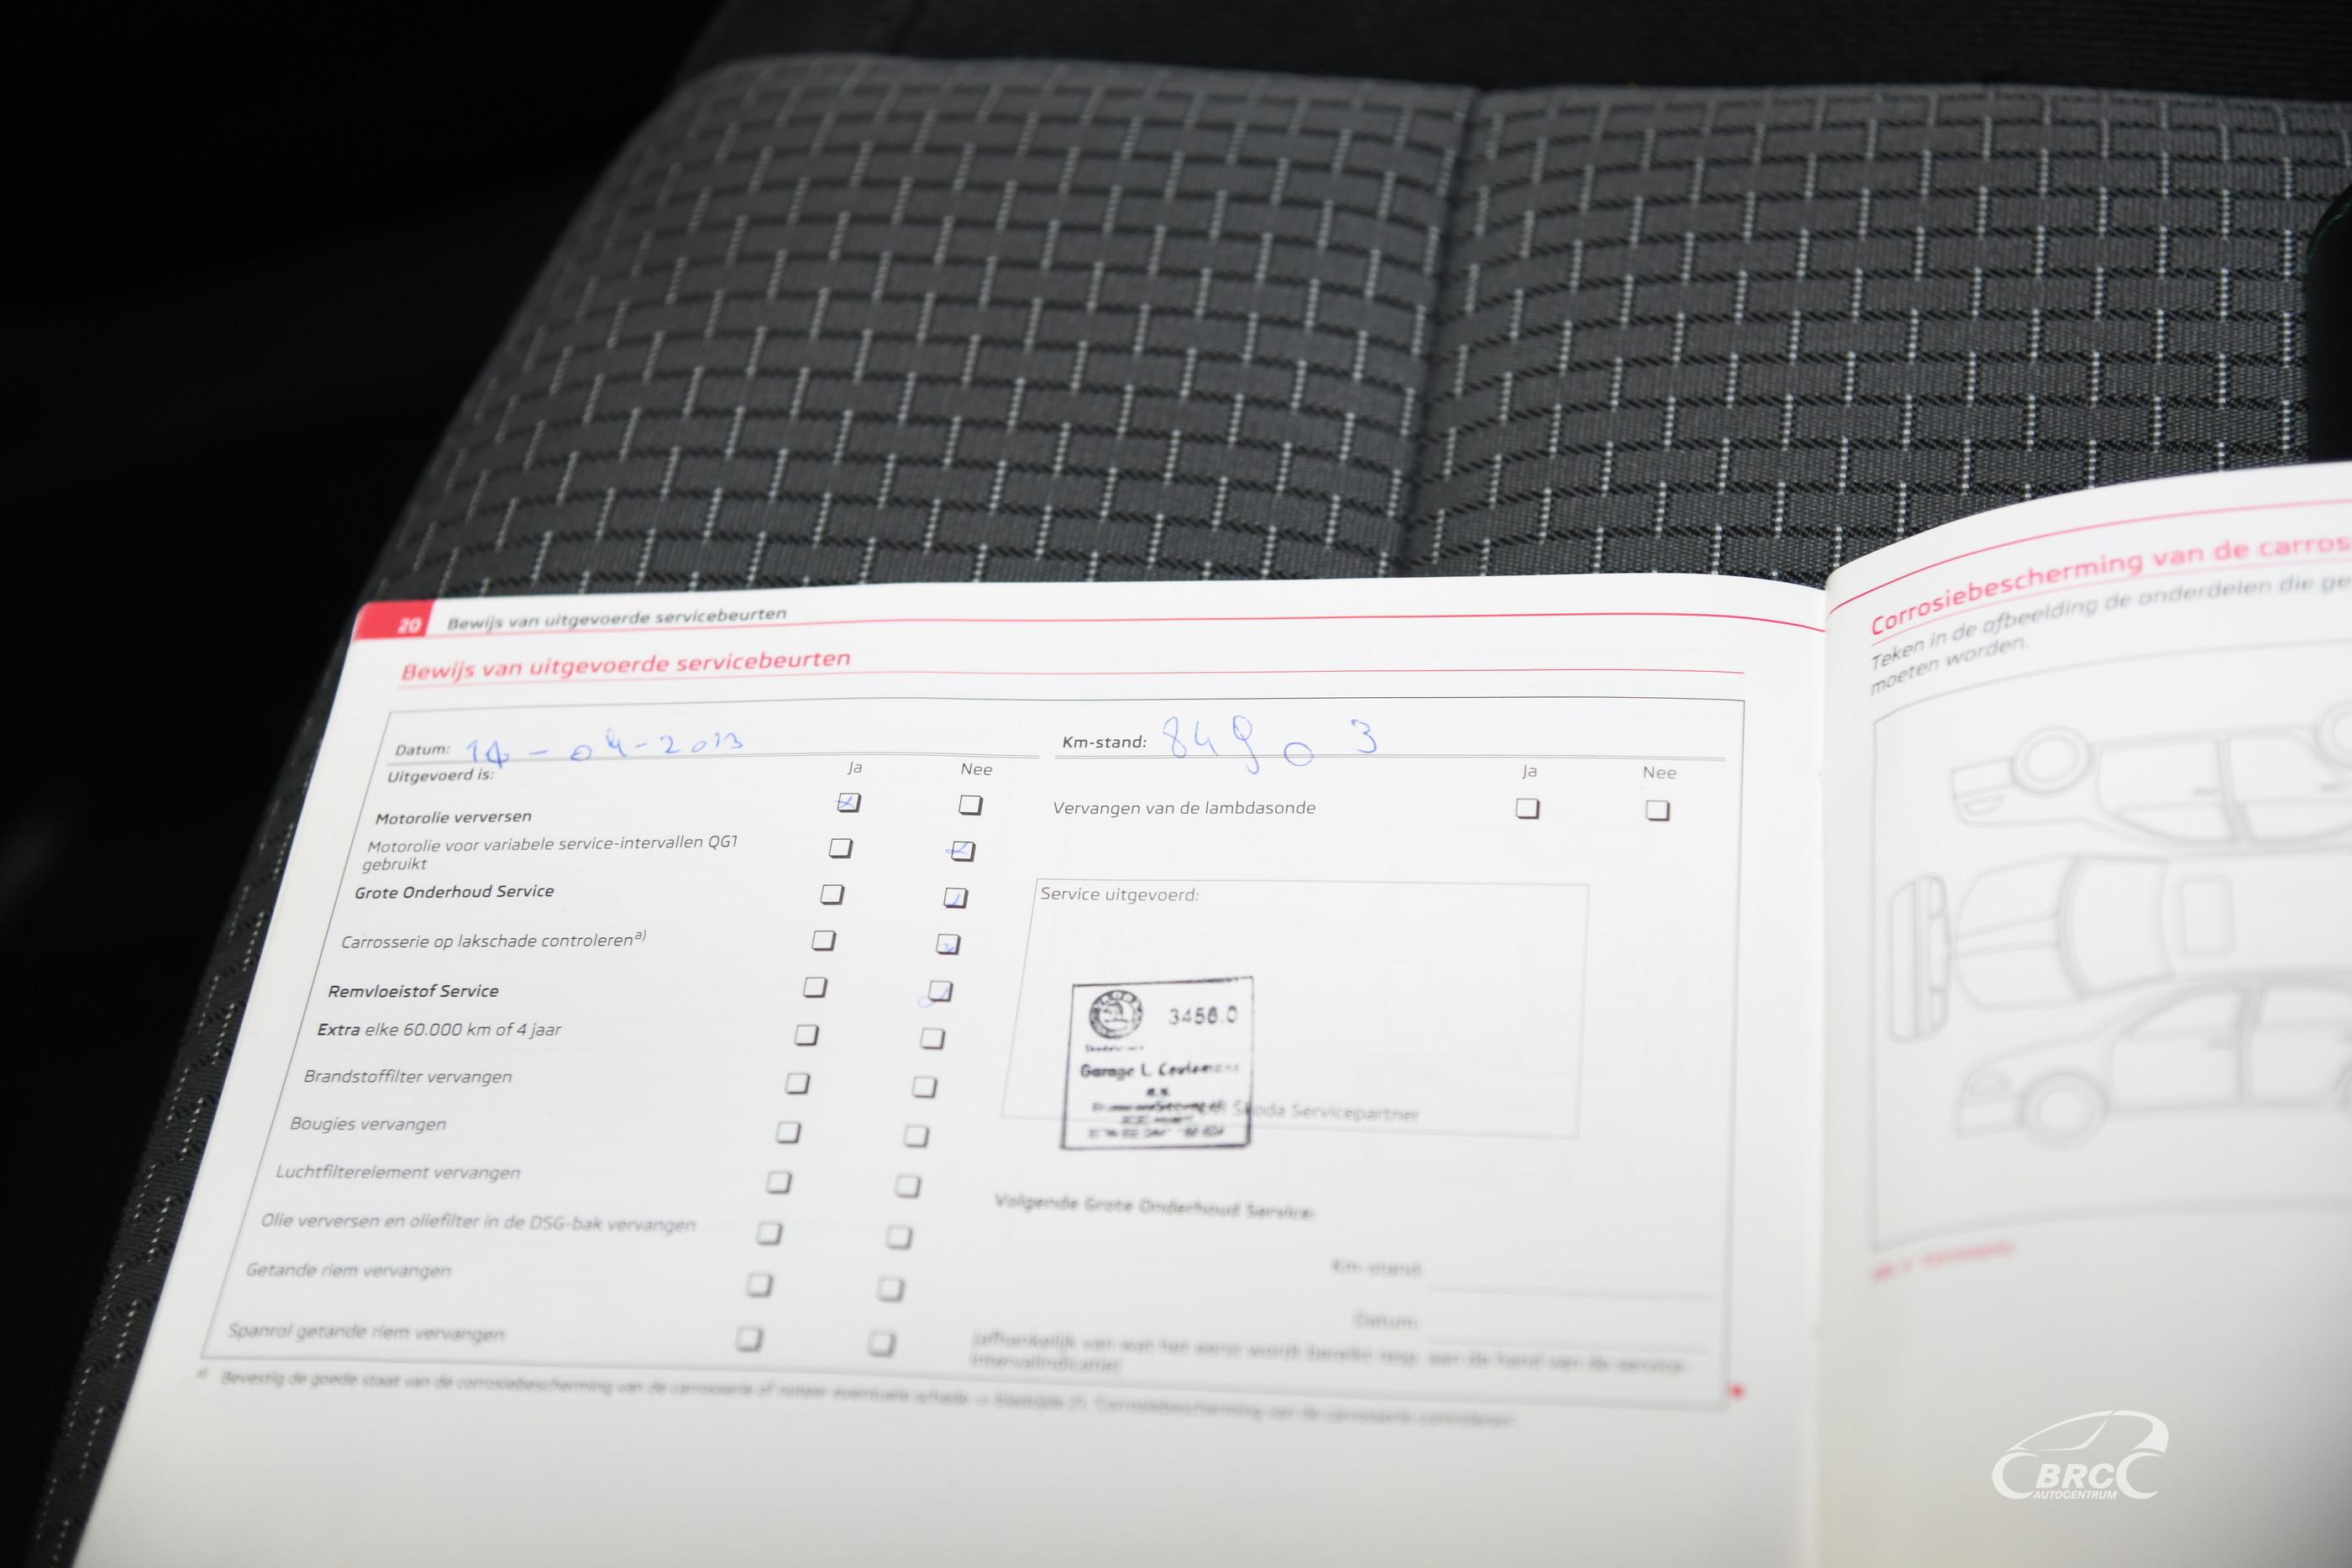 Skoda Superb 1.6 TDI Greenline